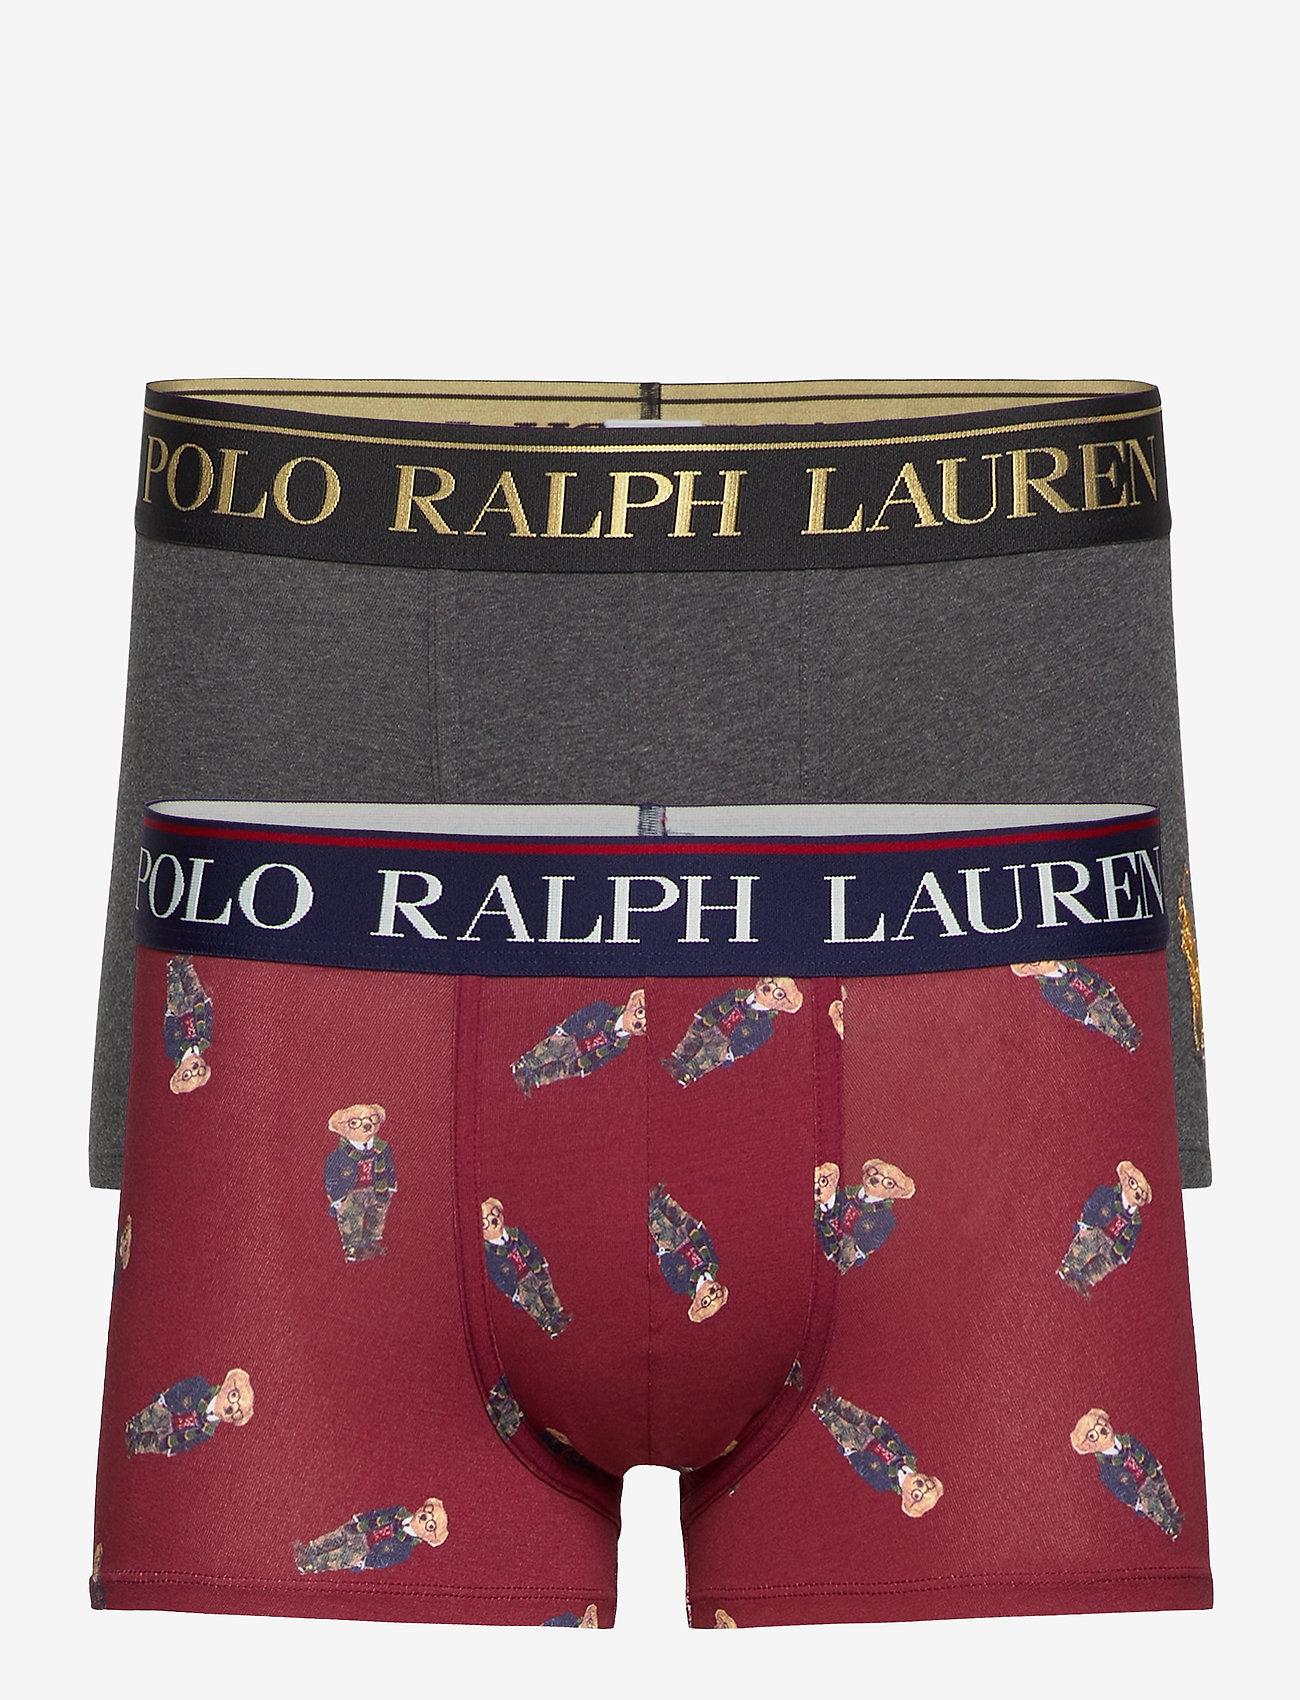 Polo Ralph Lauren Underwear - COTTON/ELASTANE-2PK-TRN - boxers - 2pk windsor hthr/ - 0